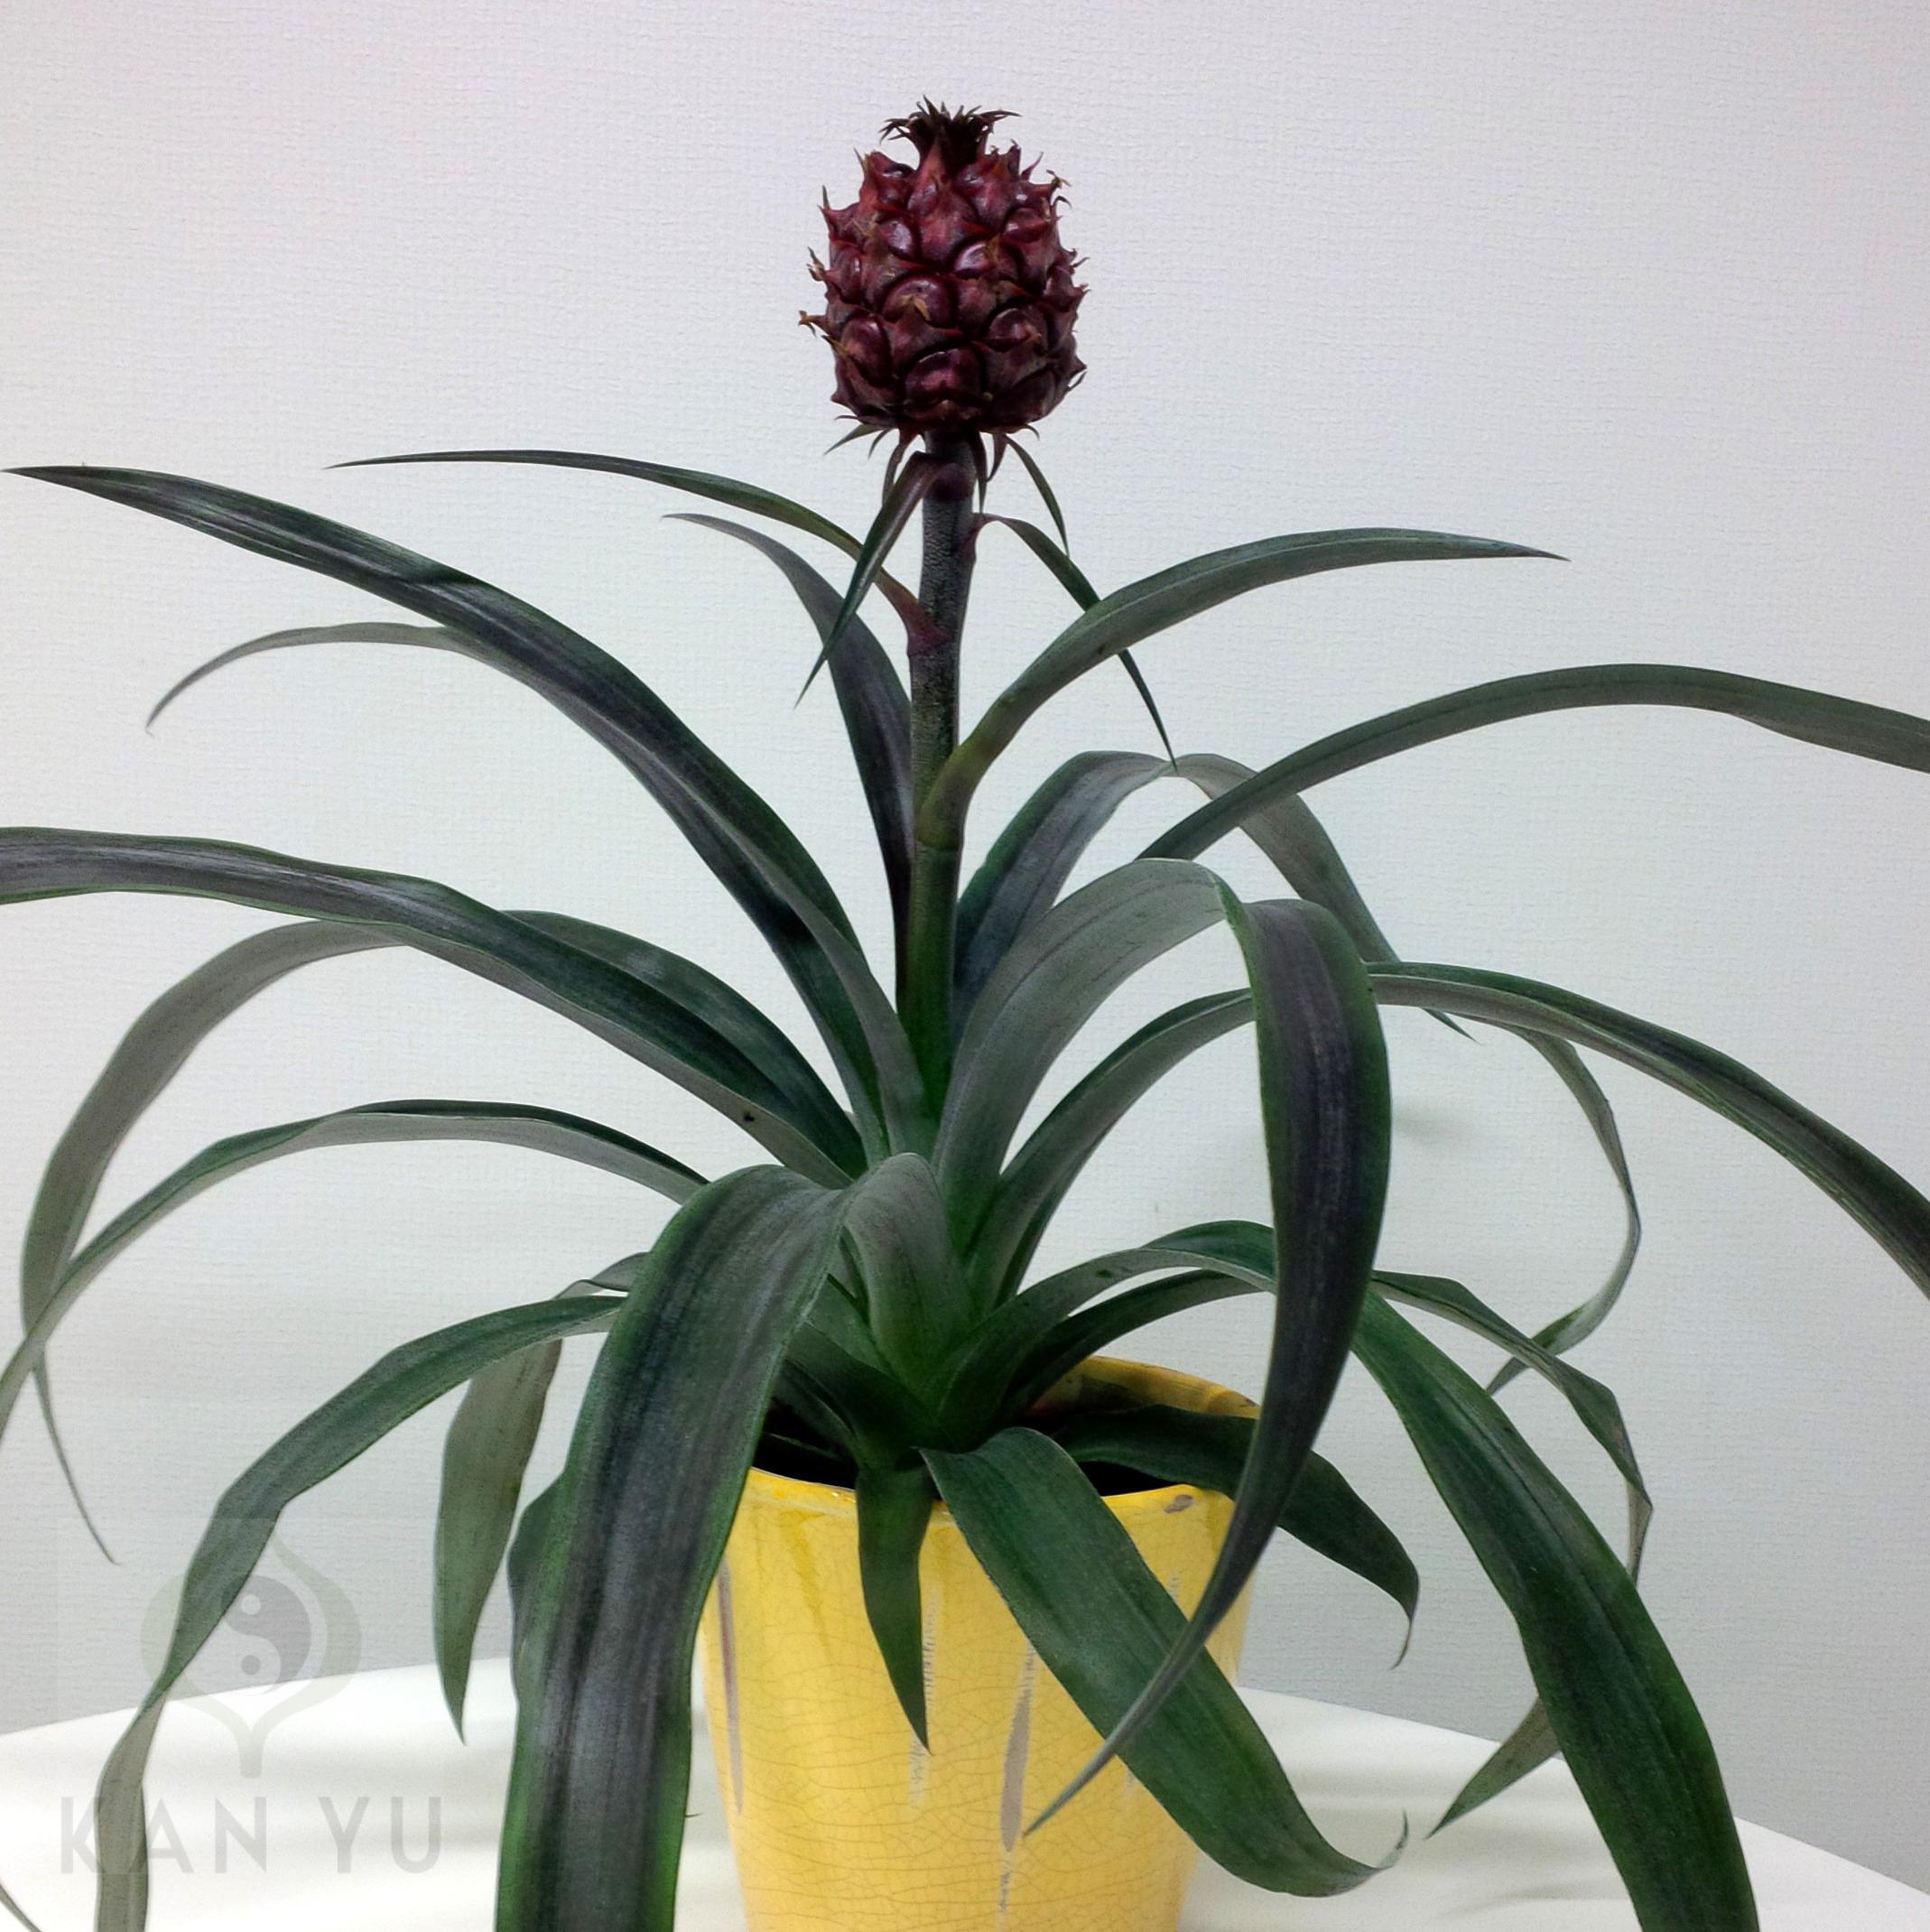 ananas ananaspflanze exotische zimmerpflanze feng shui energiepflanze ebay. Black Bedroom Furniture Sets. Home Design Ideas